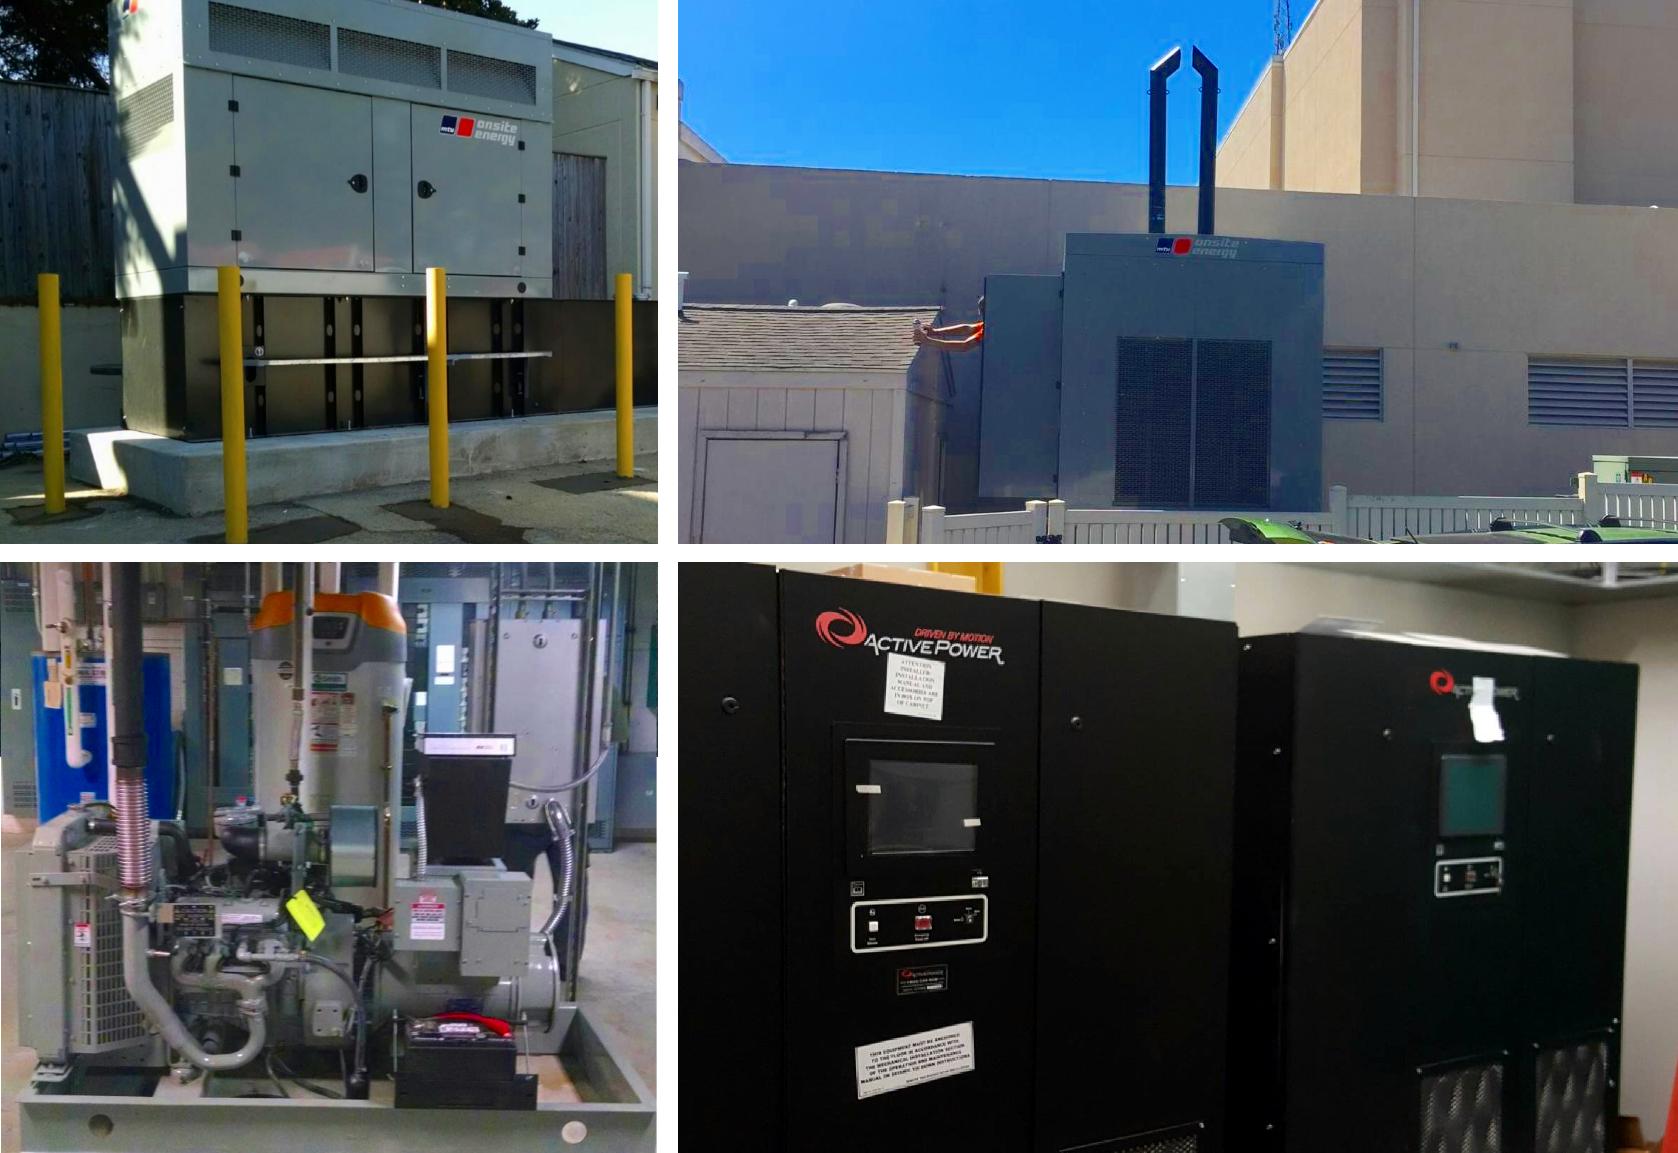 Backup Power Commercial Generator Company for repair, maintenance, service, installation in Annapolis, Glen Burnie, Arnold, Severna Park, Pasadena